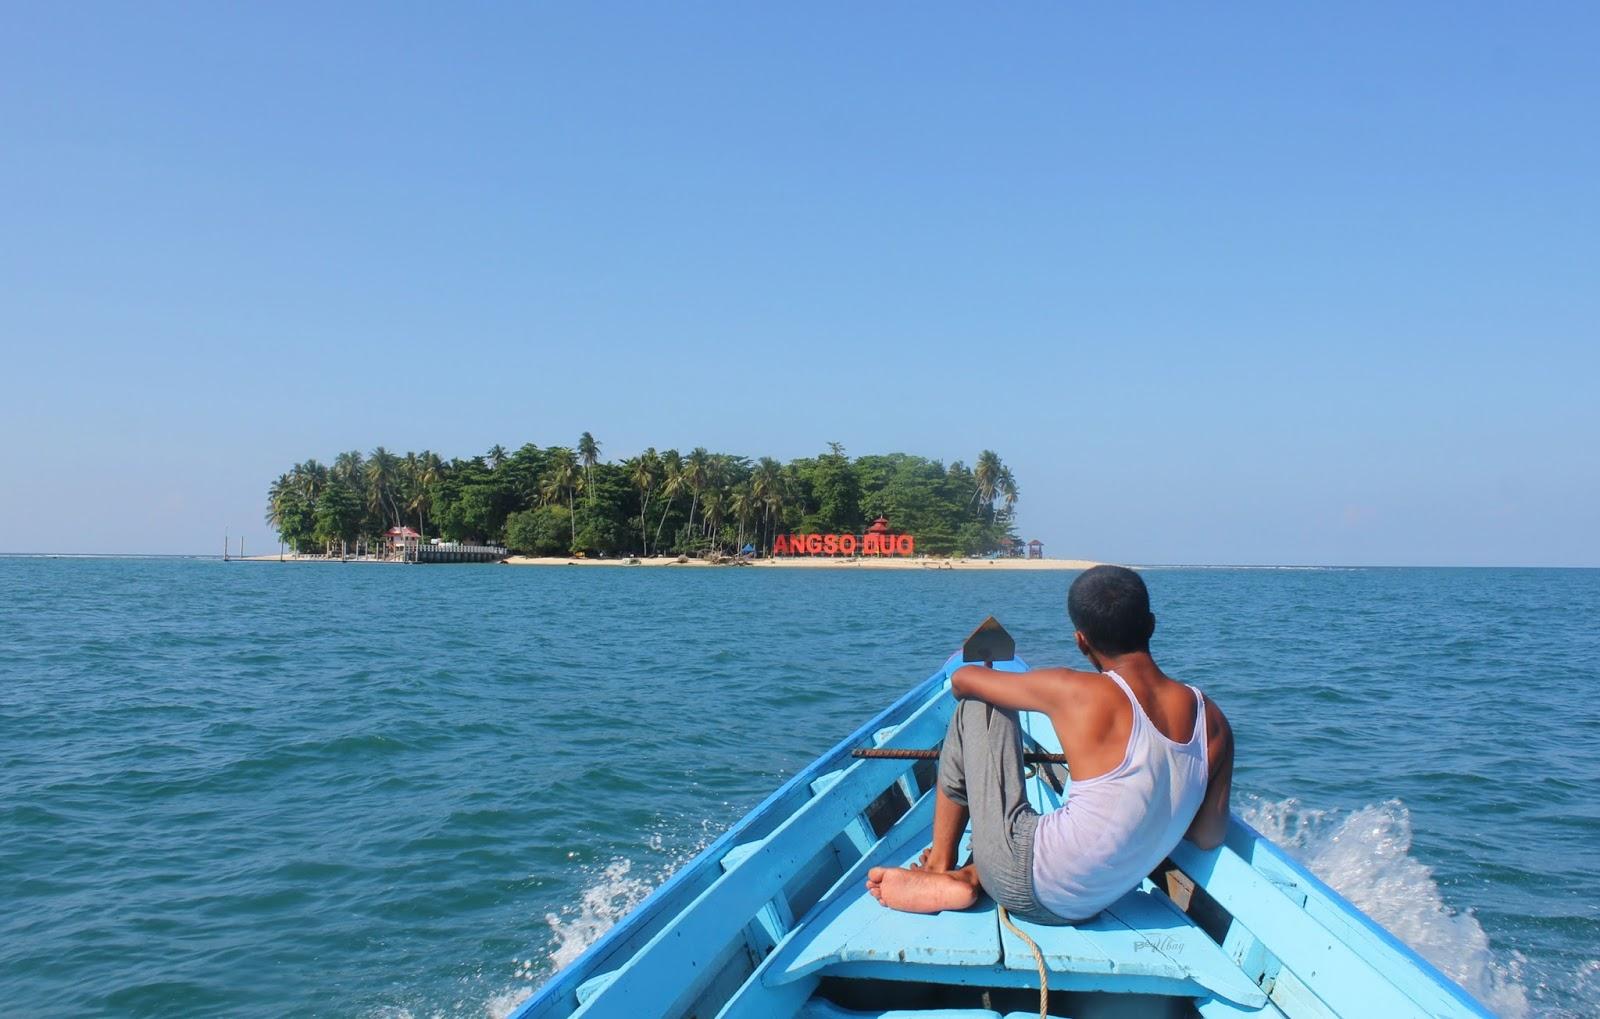 Sumber : http://kidalnarsis.blogspot.co.id/2016/05/serunya-keliling-pulau-angso-duo-yang.html